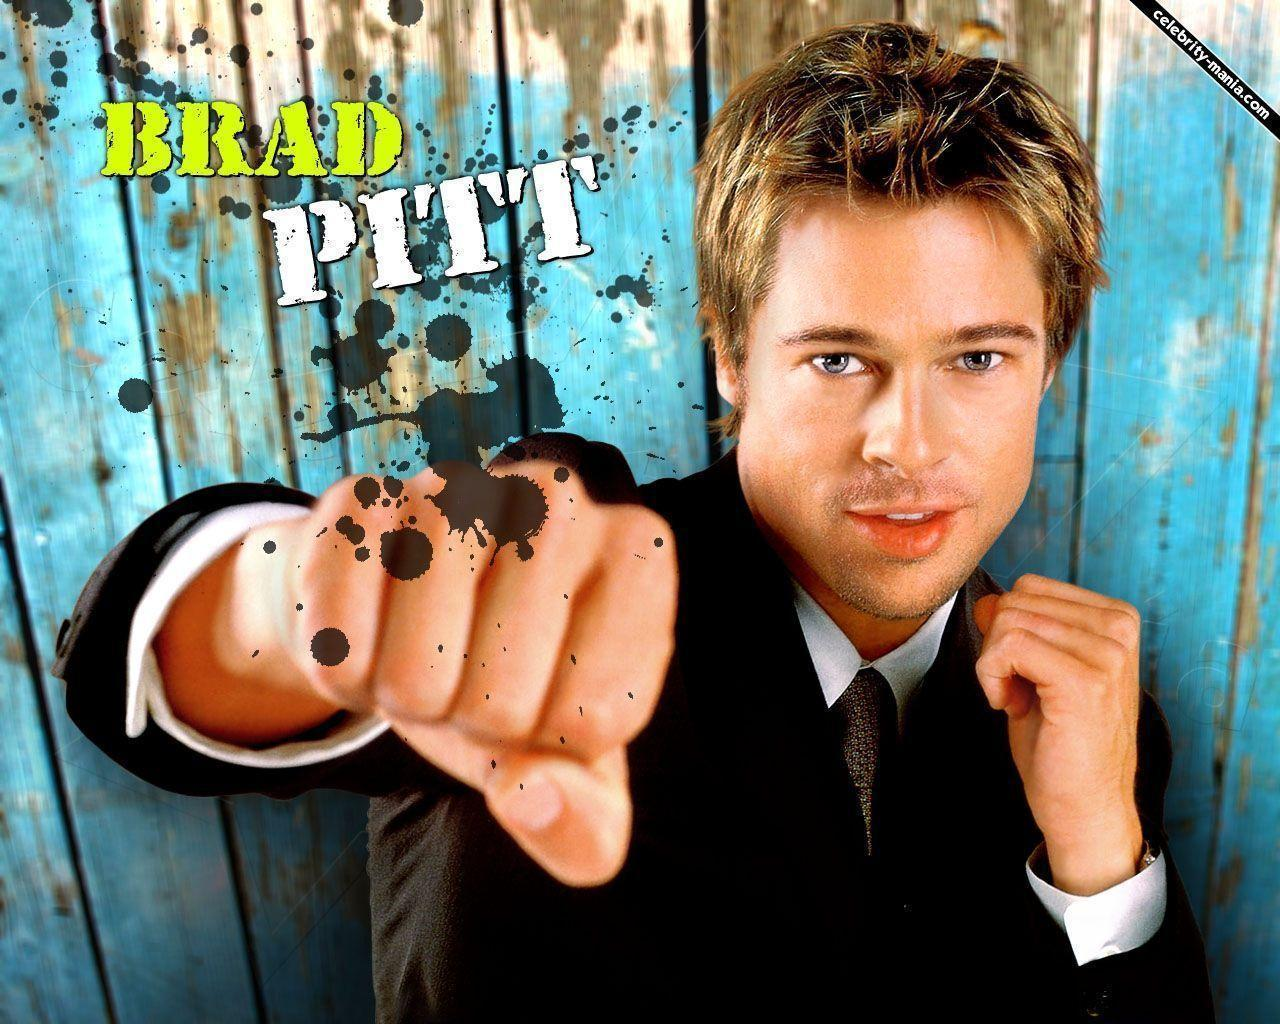 Brad Pitt Wallpapers - Wallpaper Cave - photo #5